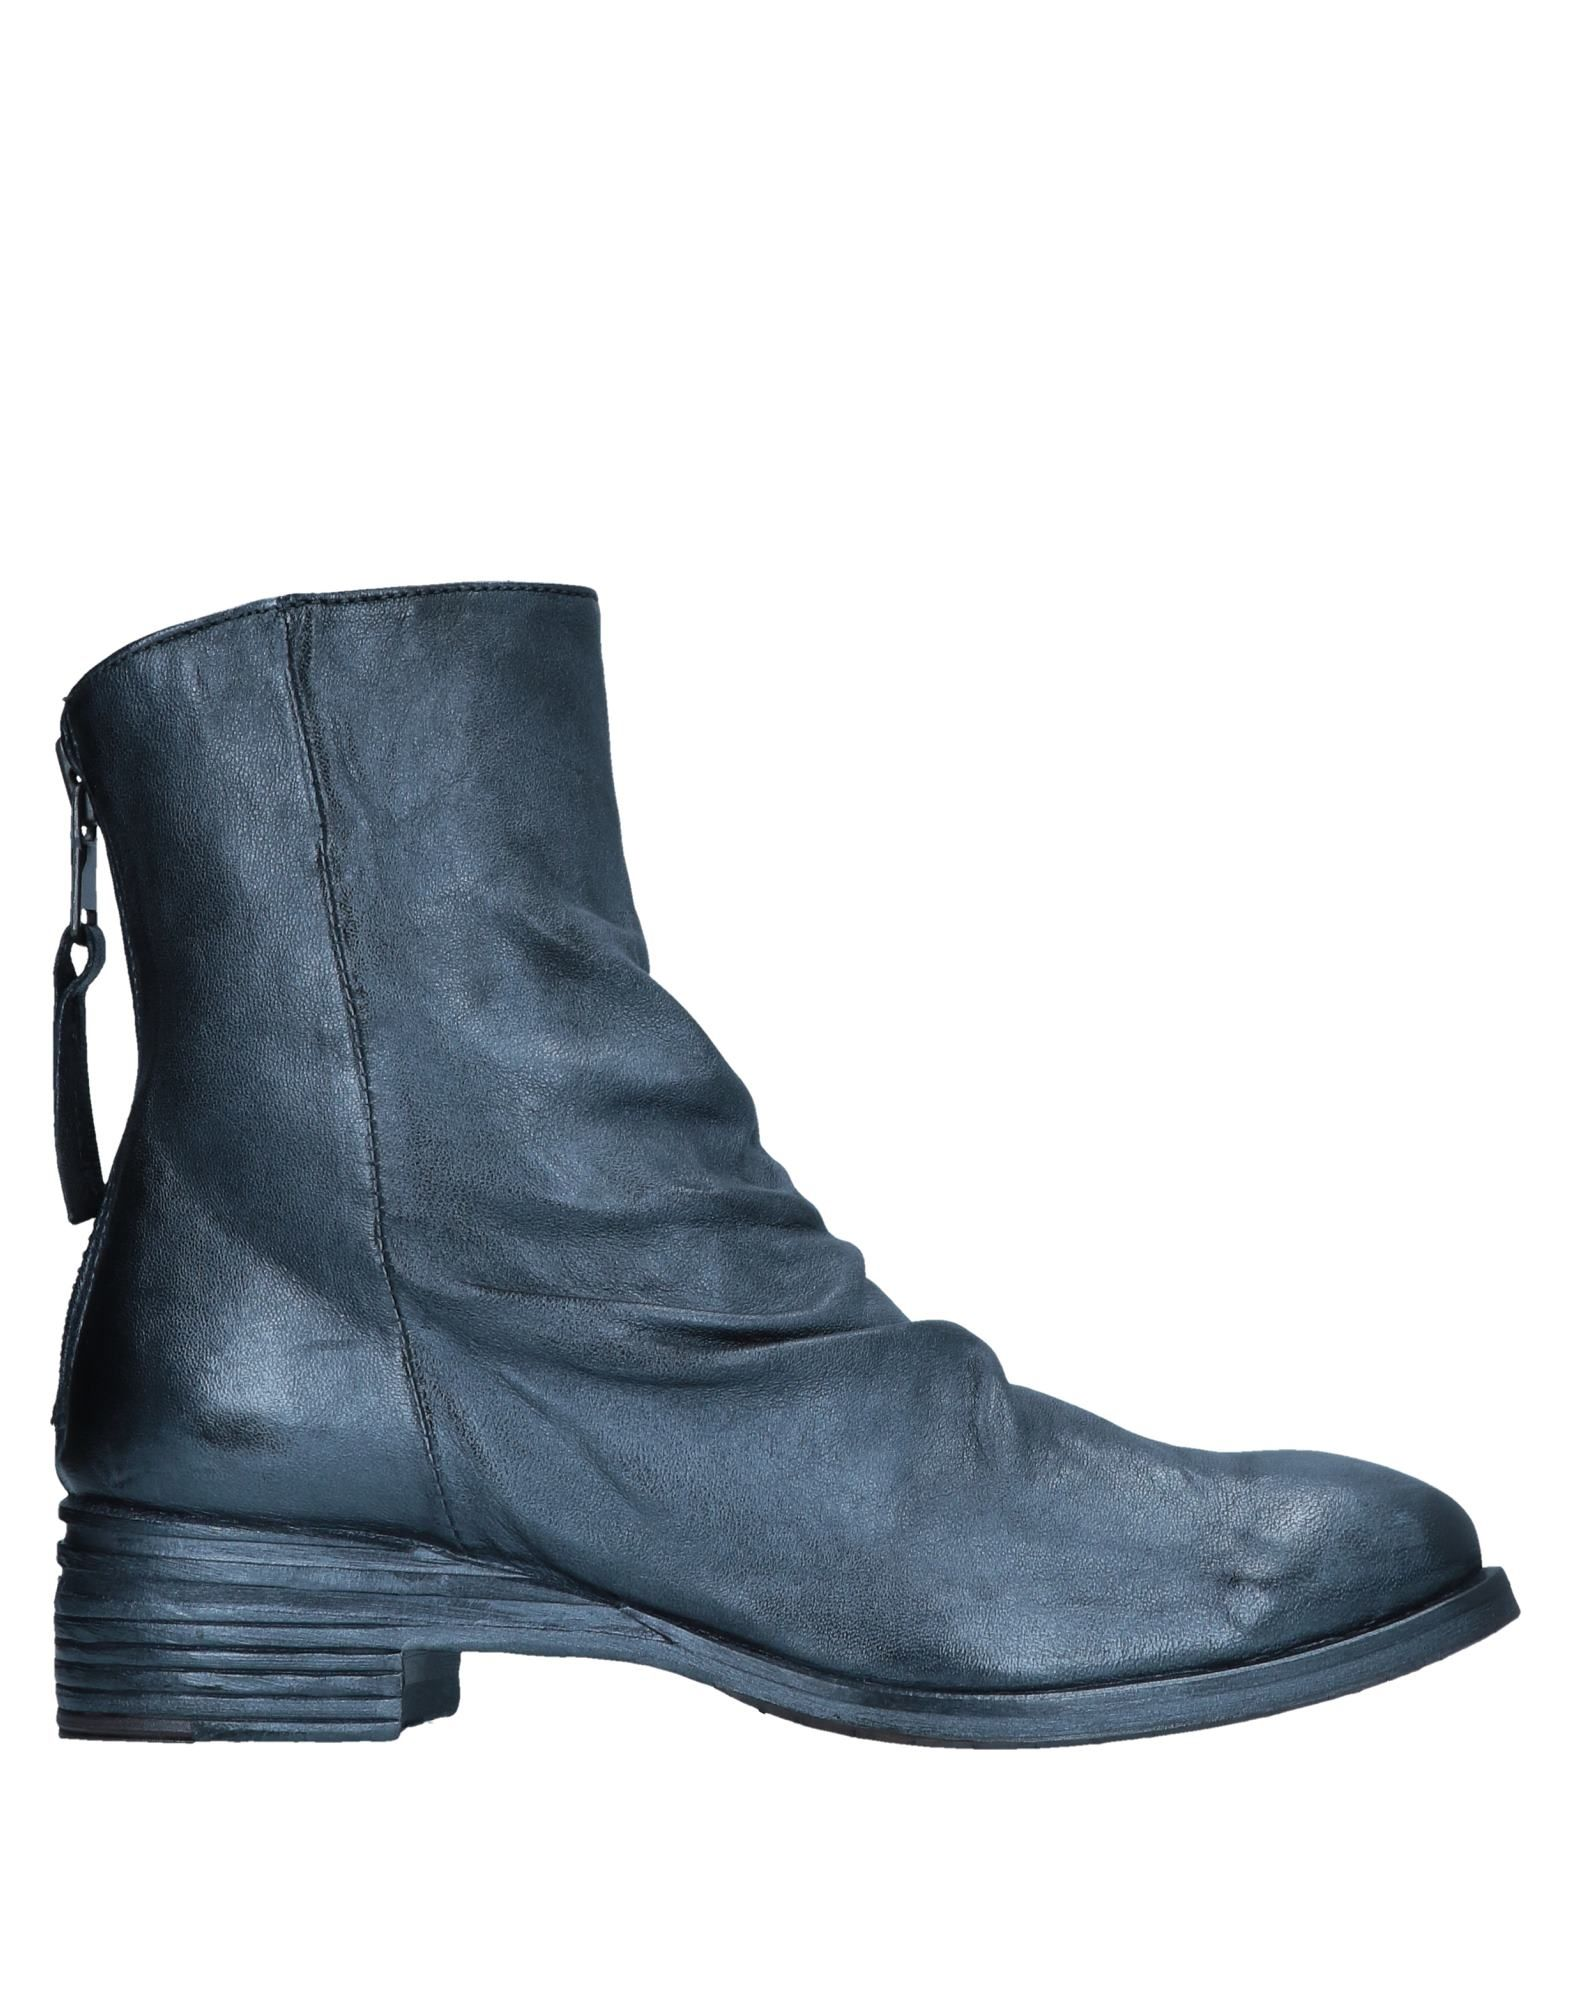 Elia Maurizi Stiefelette Damen  11551150XHGut aussehende strapazierfähige Schuhe